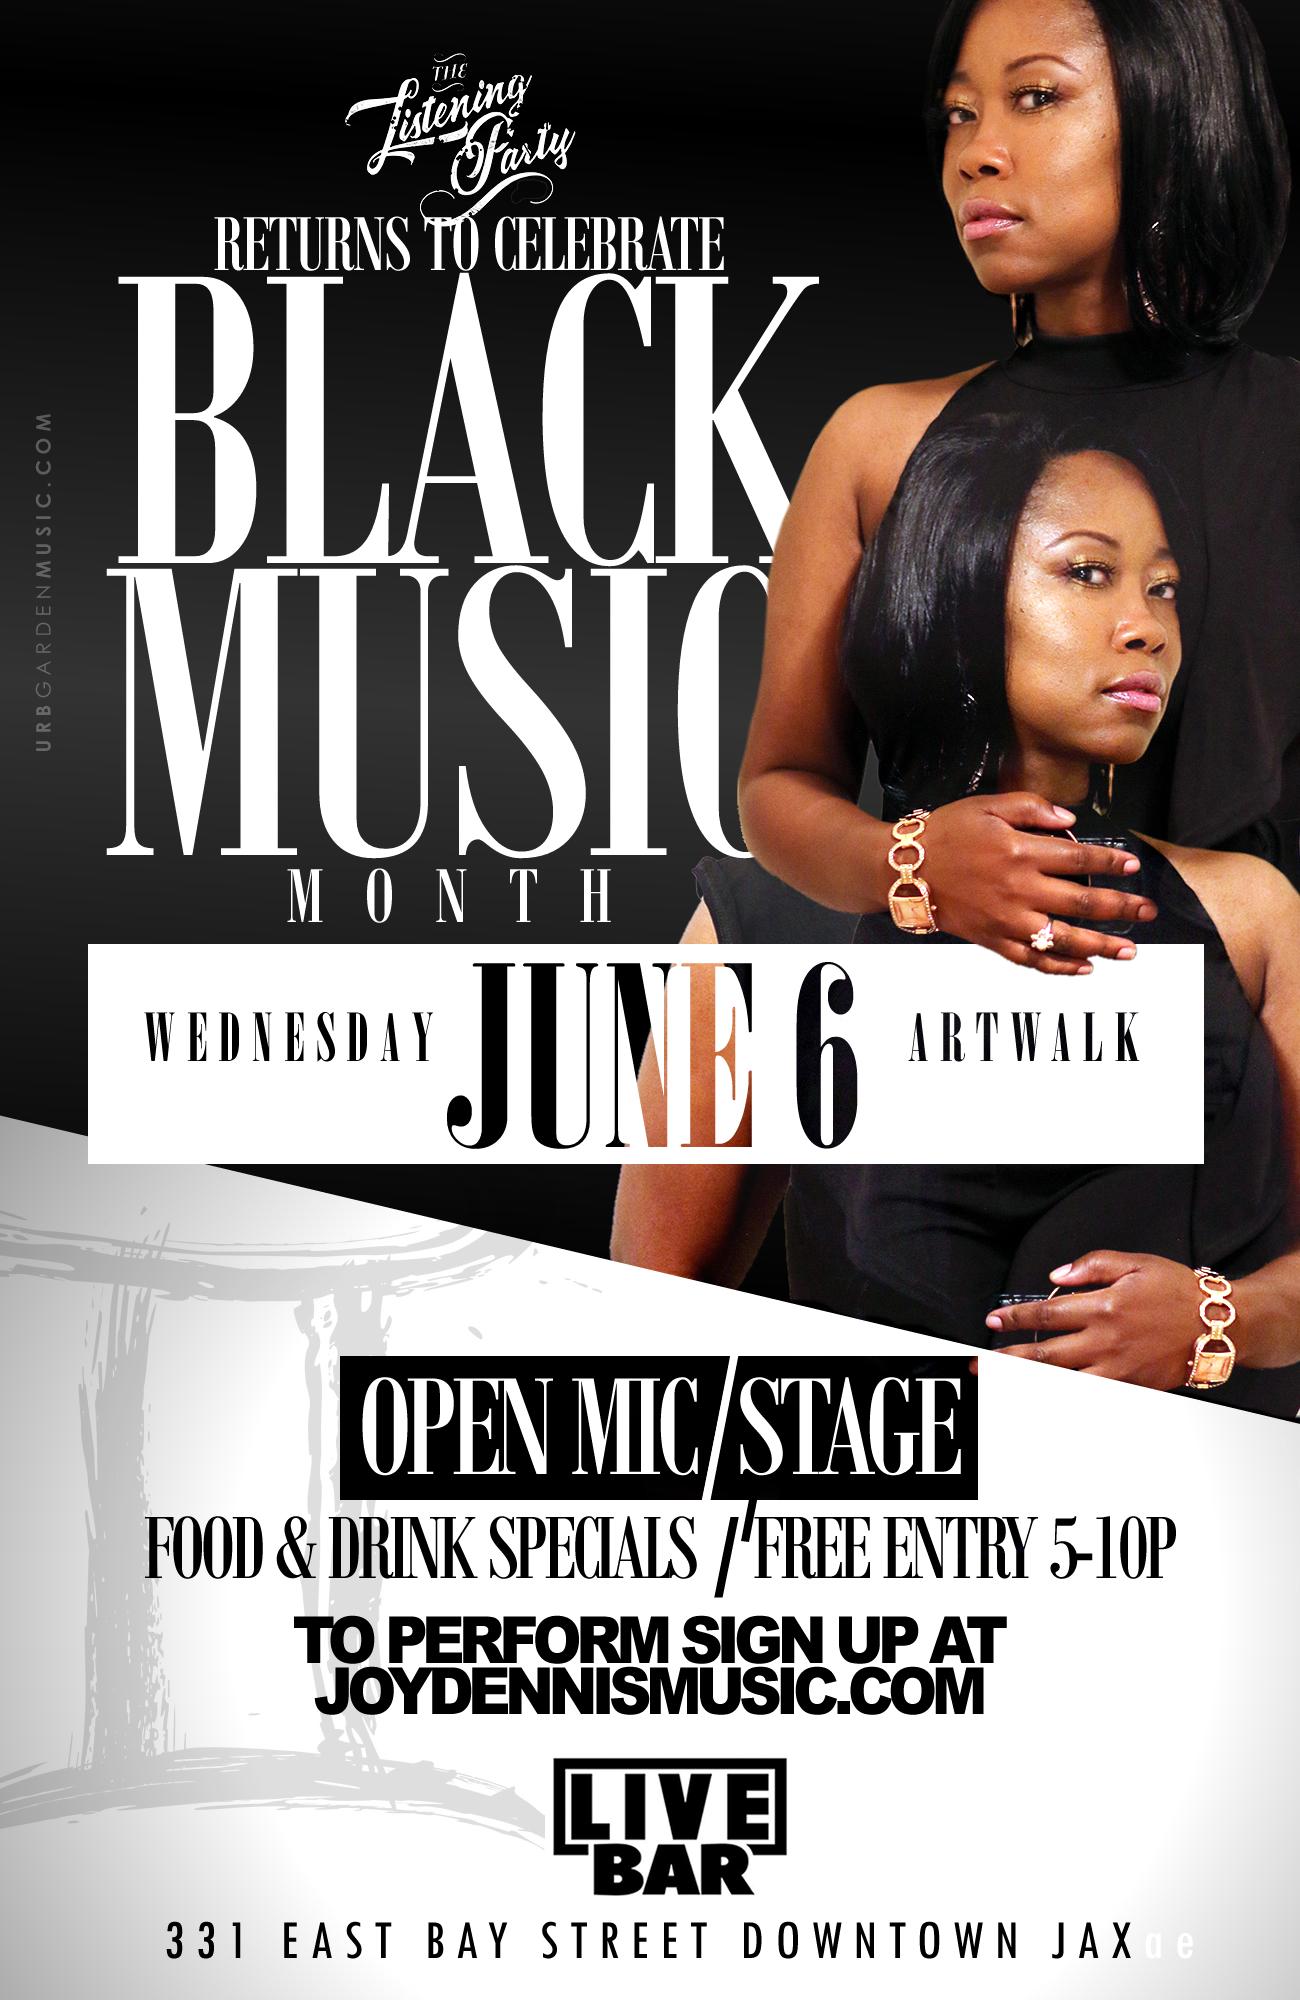 Black Music Month Celebration & Open Mic (June 6 – Artwalk)